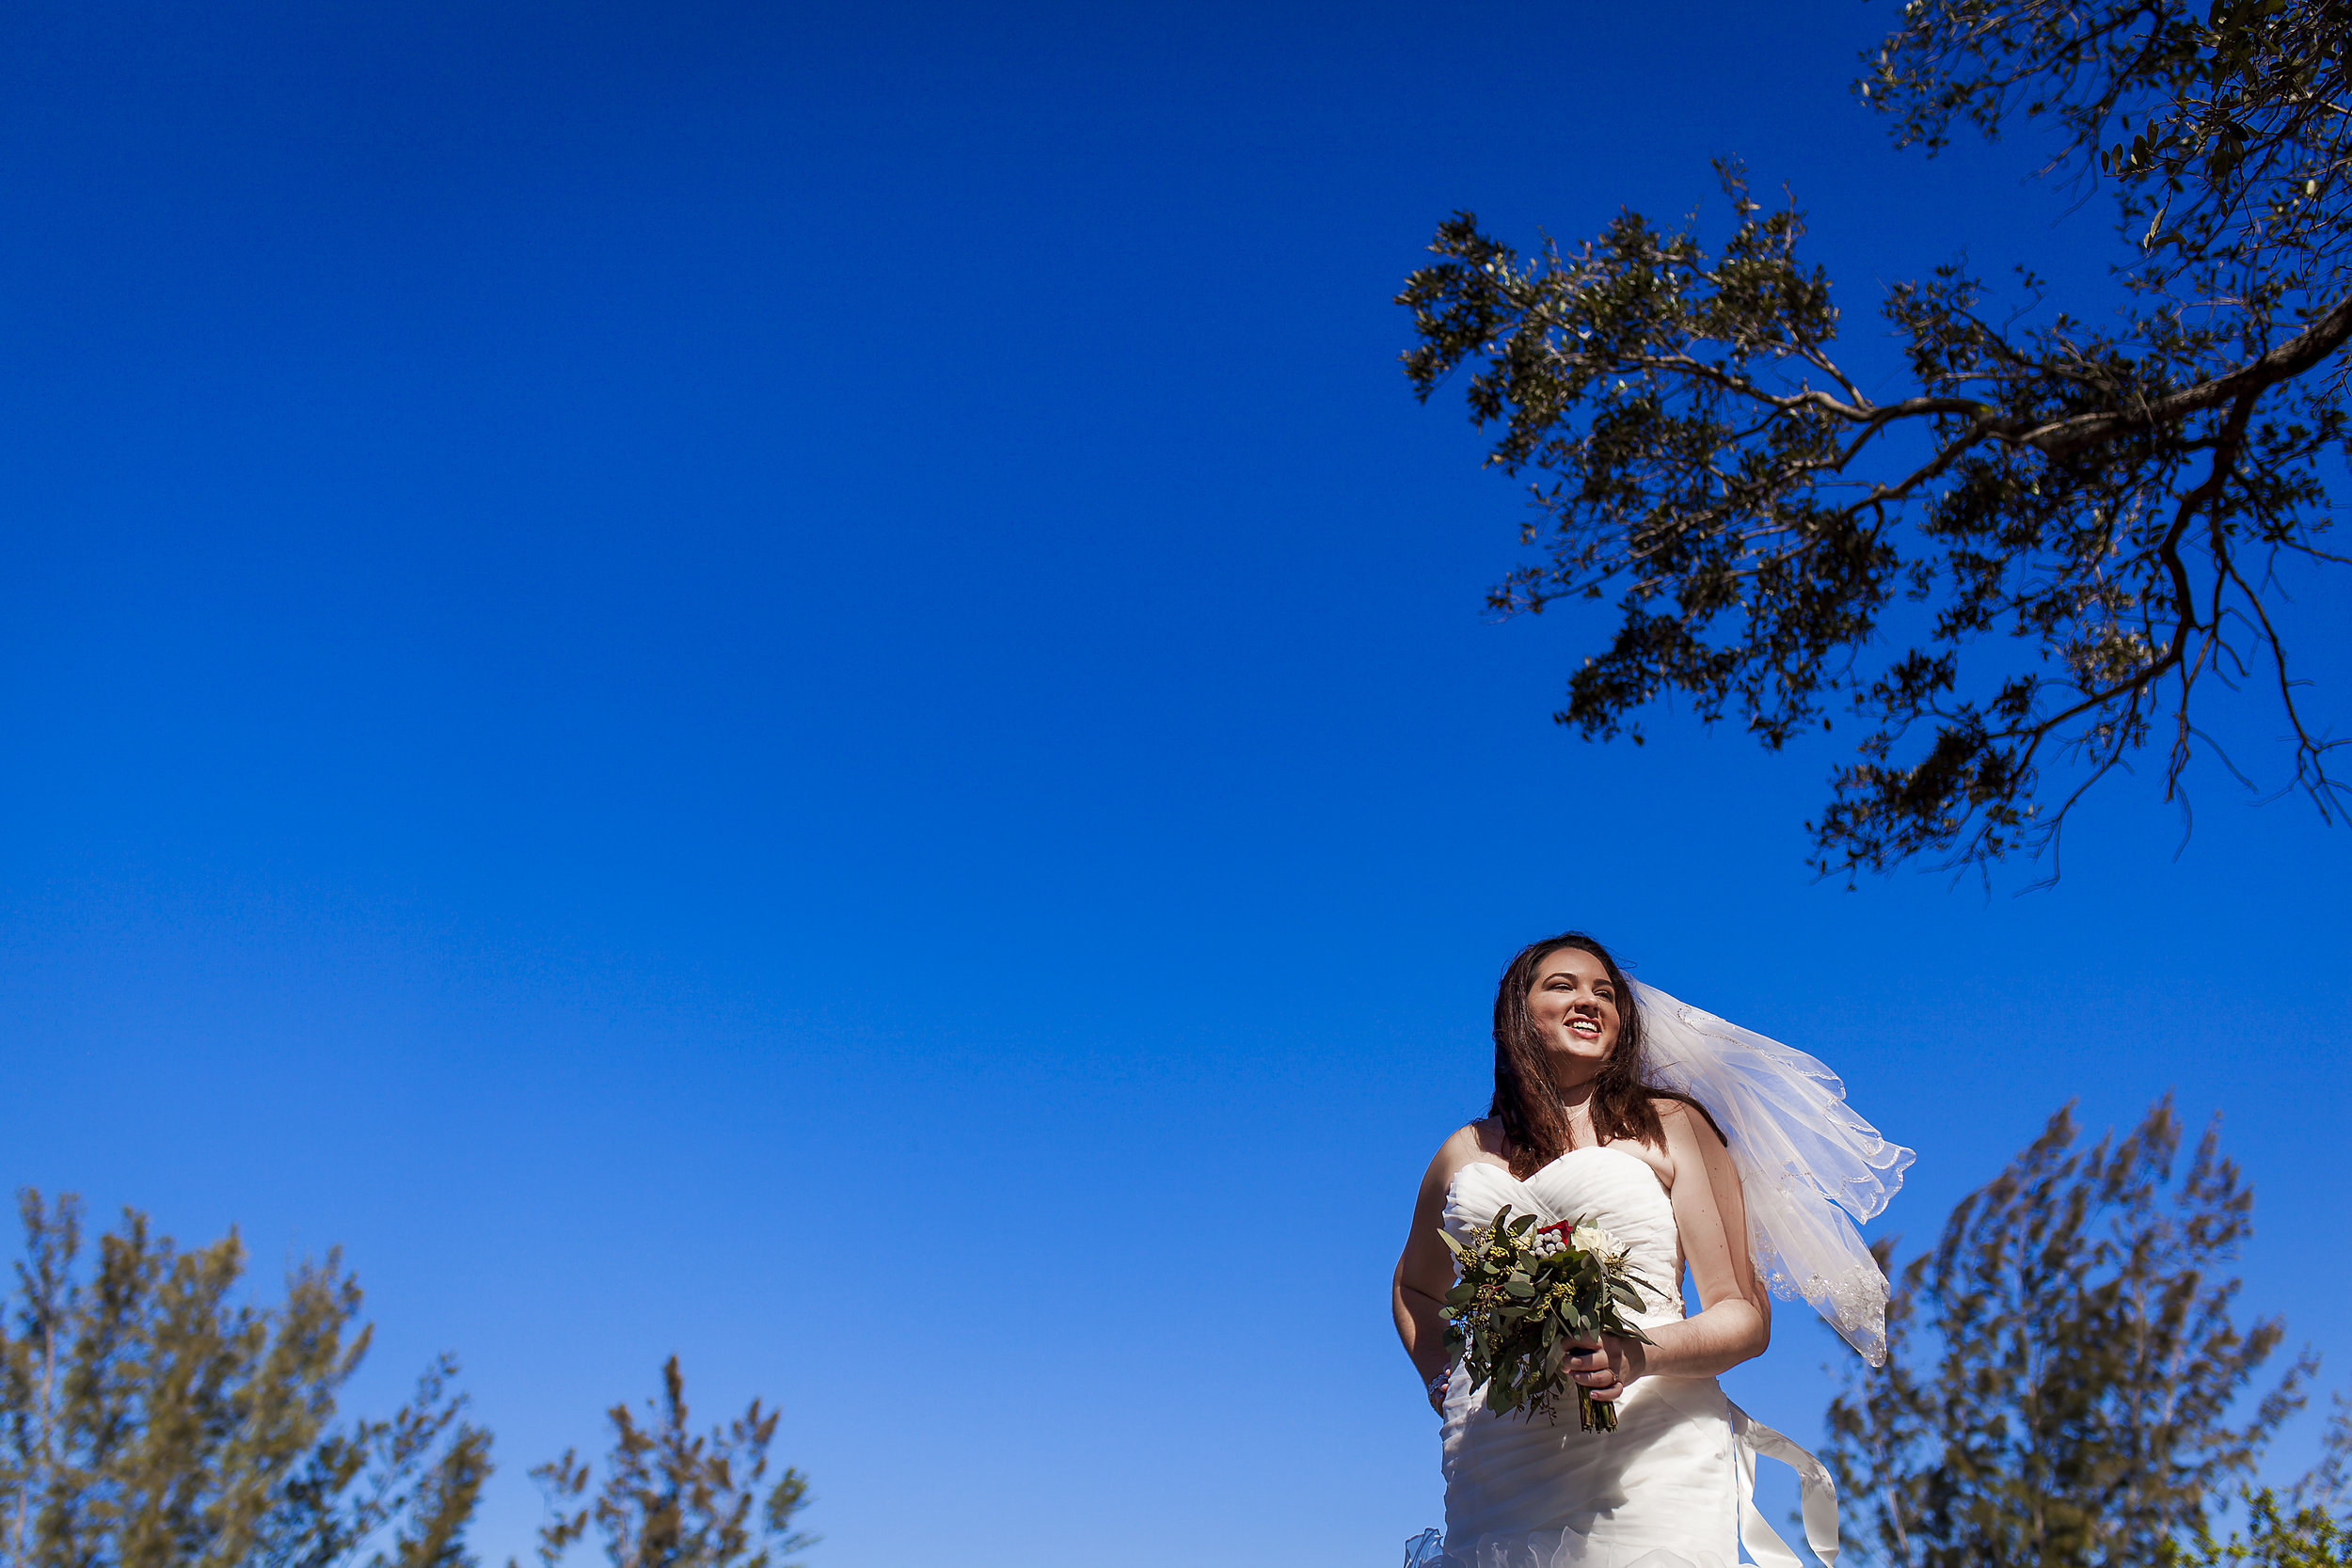 outdoor-rustic-wedding-cbsmith-park-sl-1242.jpg